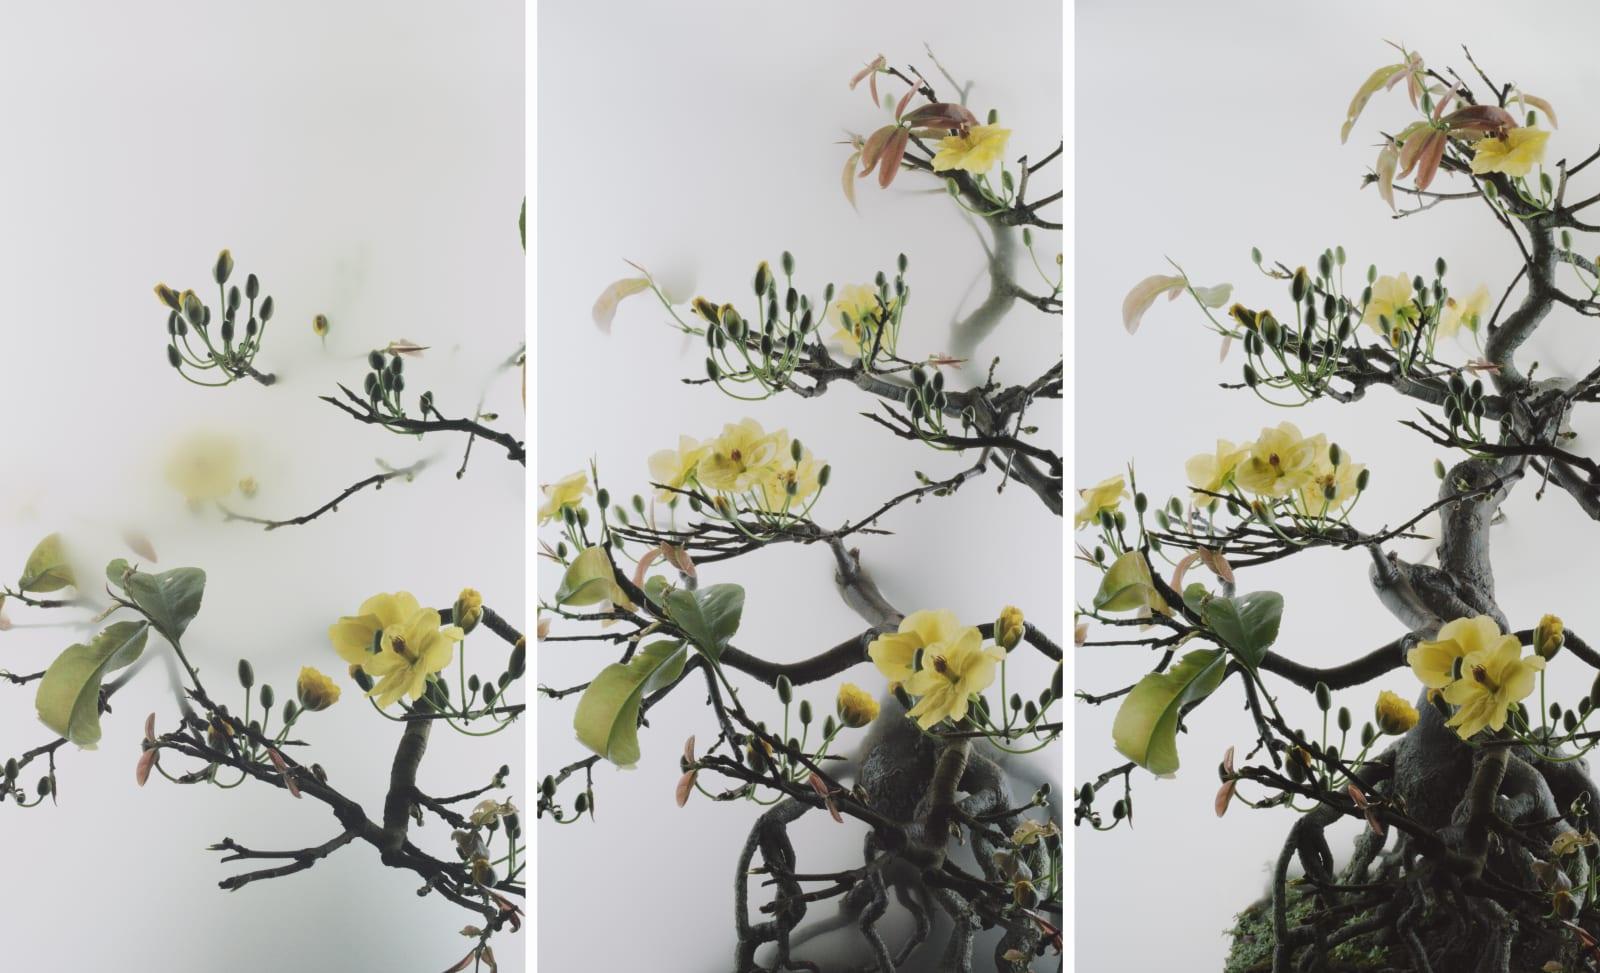 Wu Chi-Tsung 吳季璁, Still Life 014 - Yellow Mai Flower 小品之十四 - 黃梅, 2020